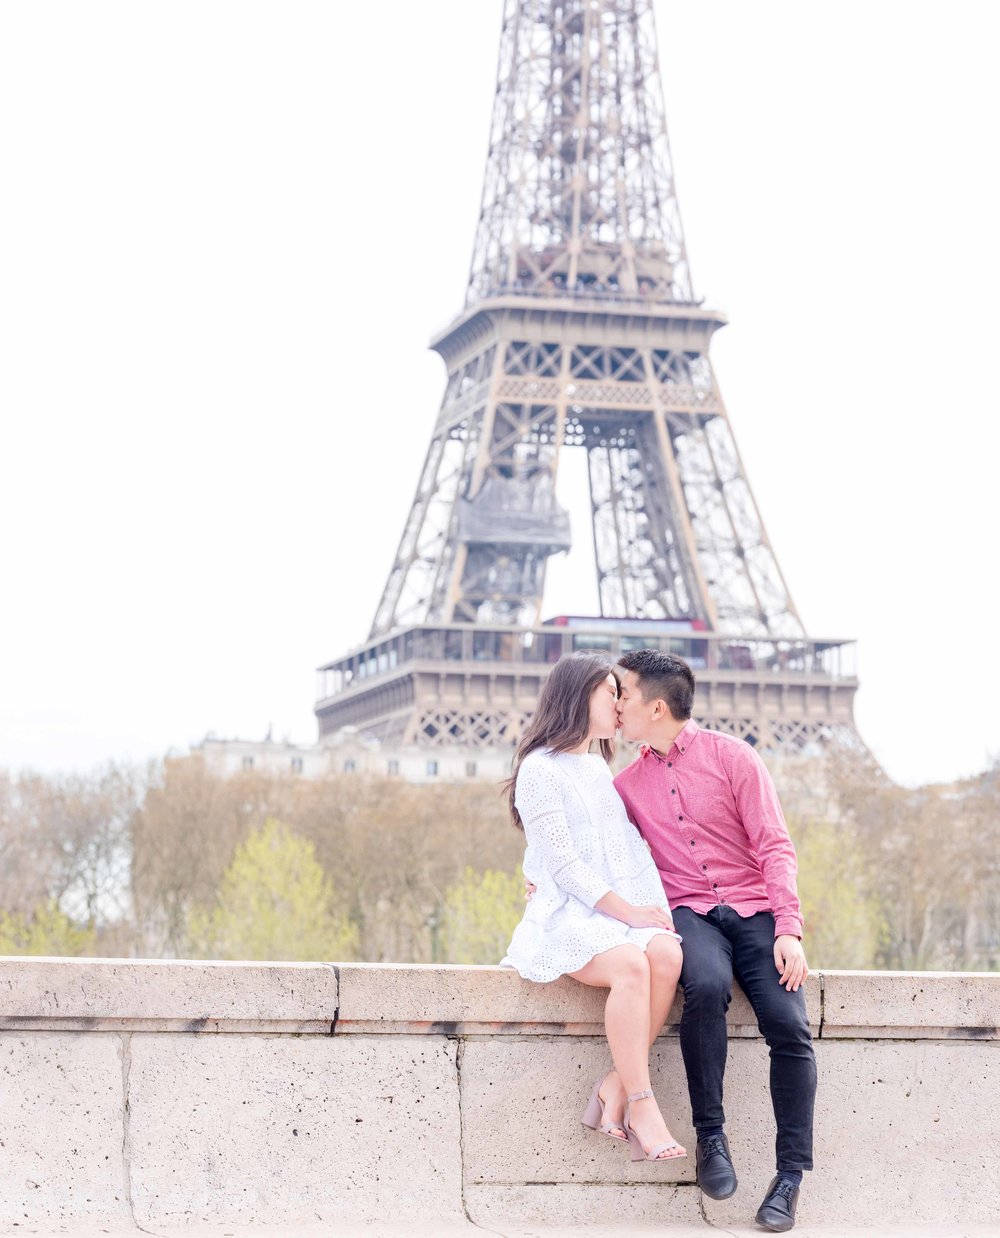 eiffel tower paris surprise proposal couple kissing she said yes